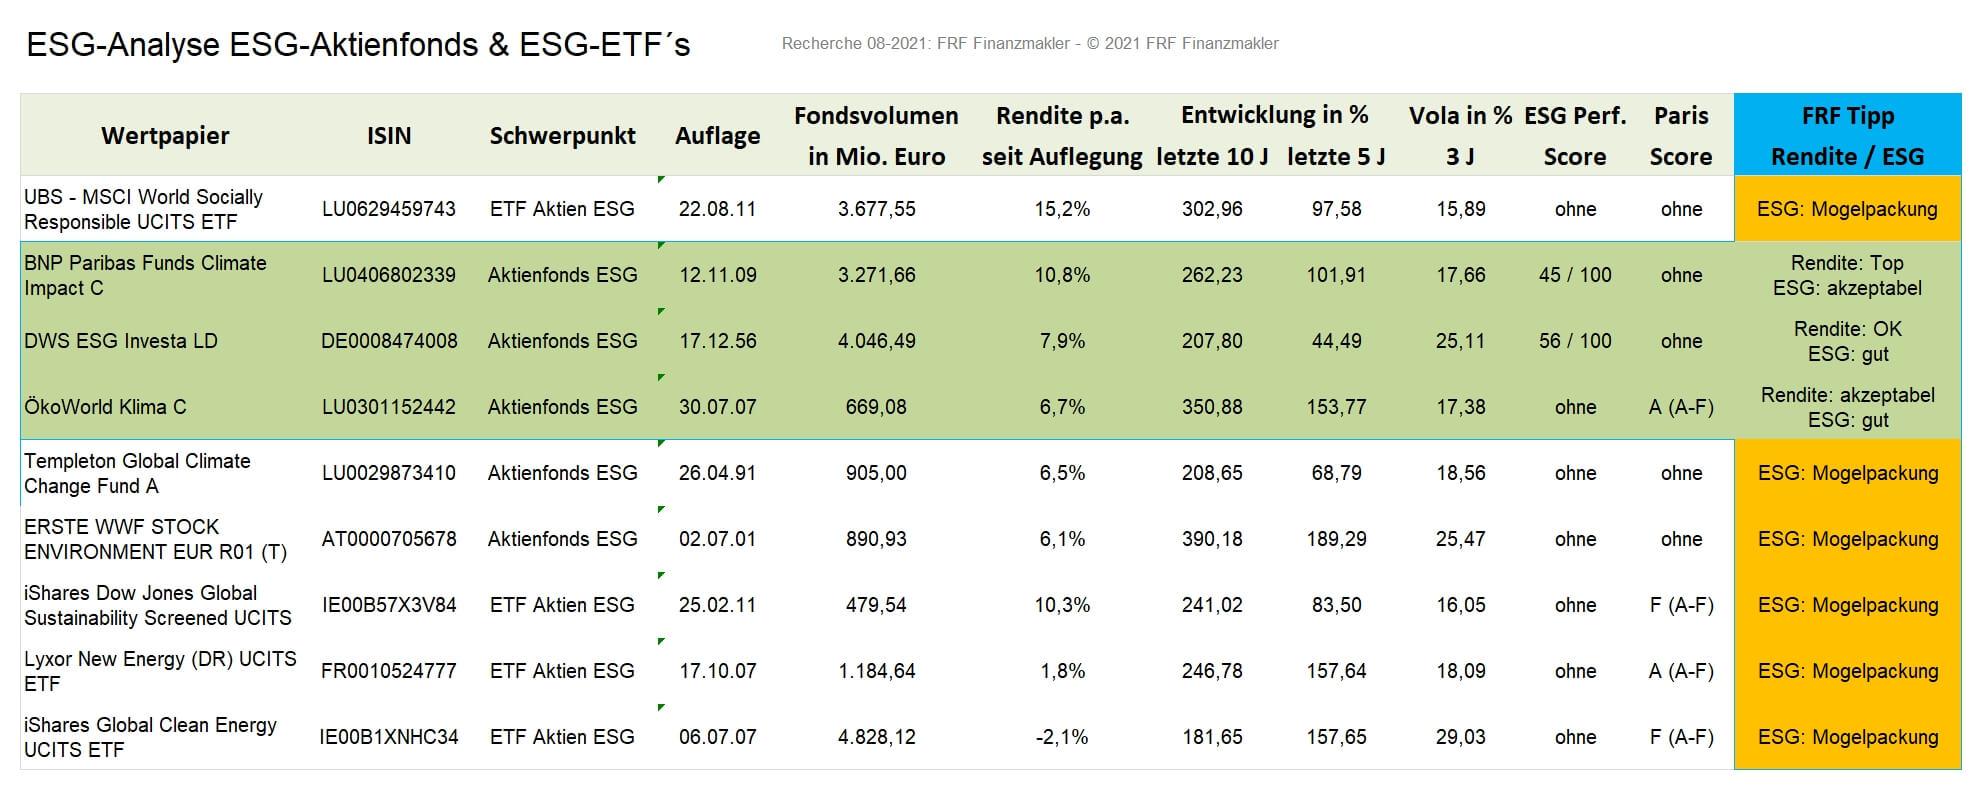 ESG-Fonds Mogelpackung